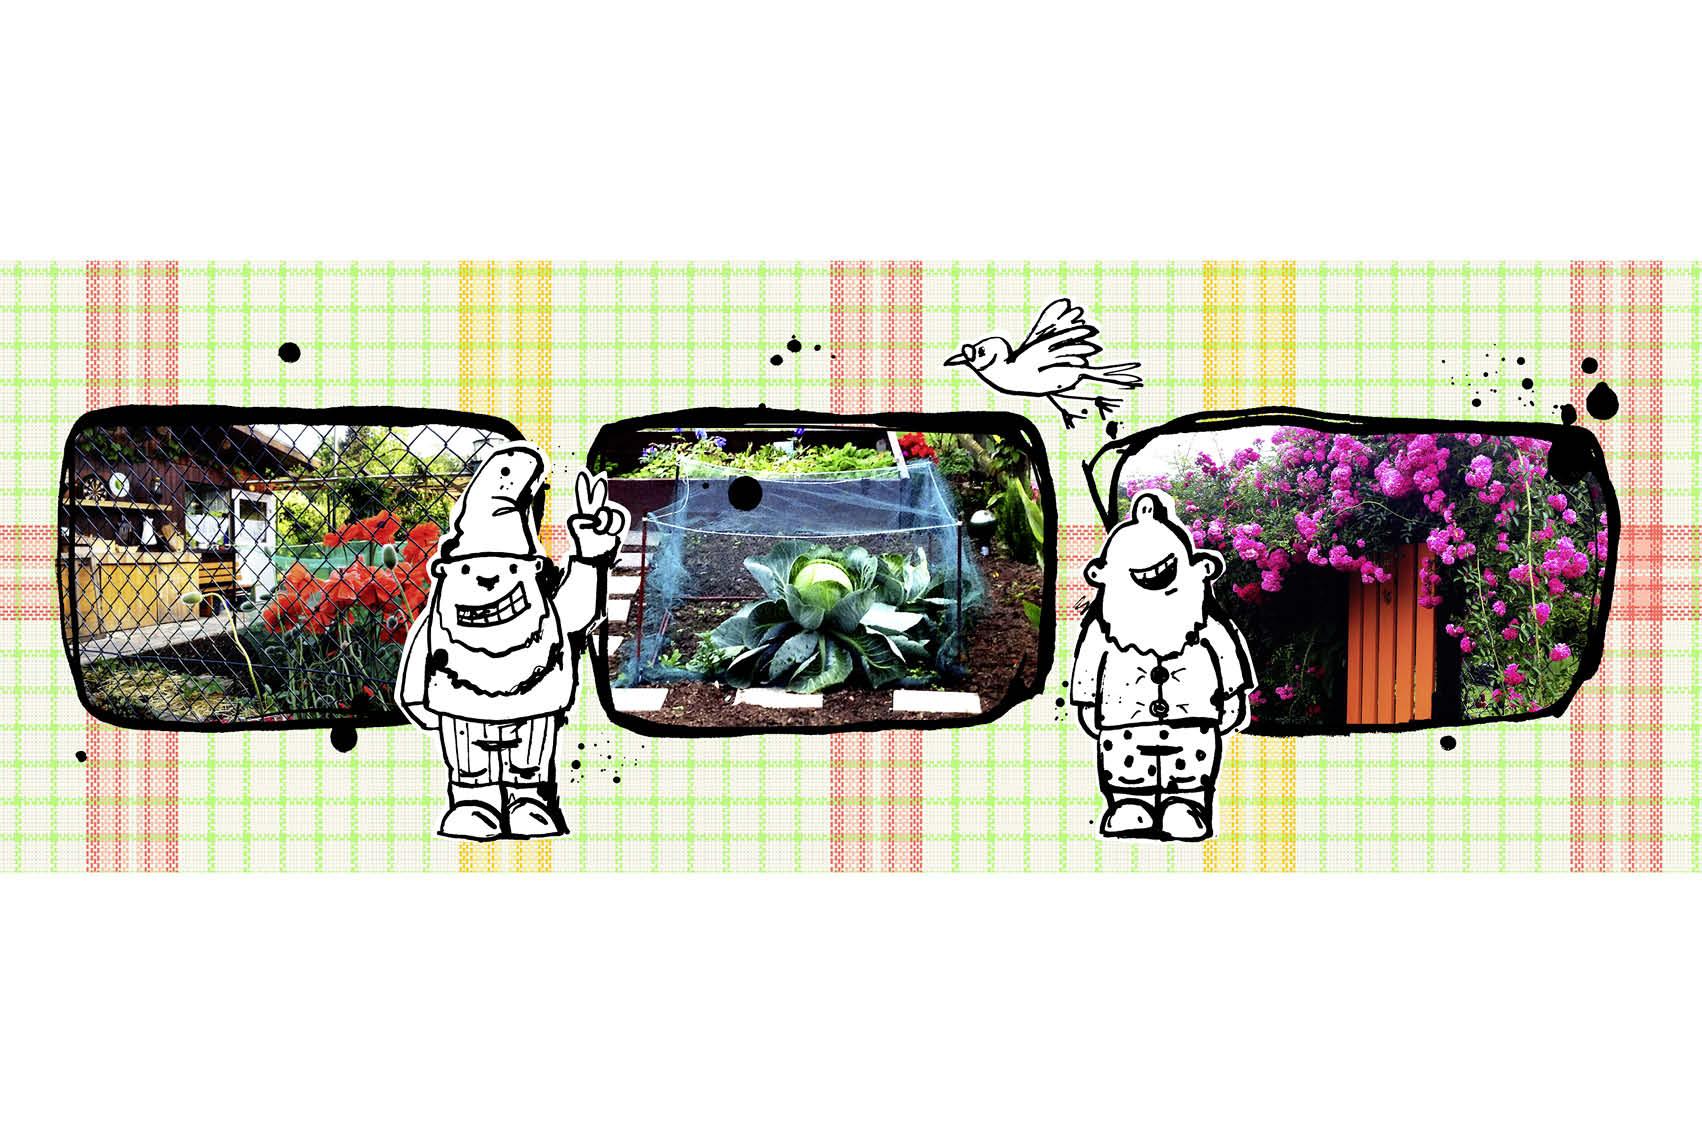 illustration-kunst-einmachglas-09.jpg